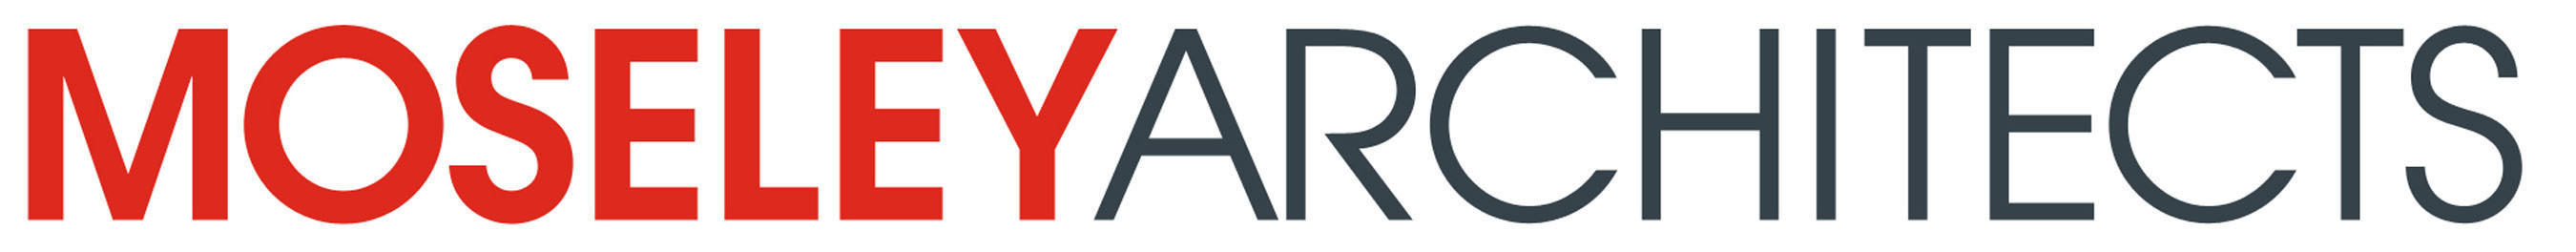 Moseley Architects Logo. (PRNewsFoto/Moseley Architects) (PRNewsFoto/)